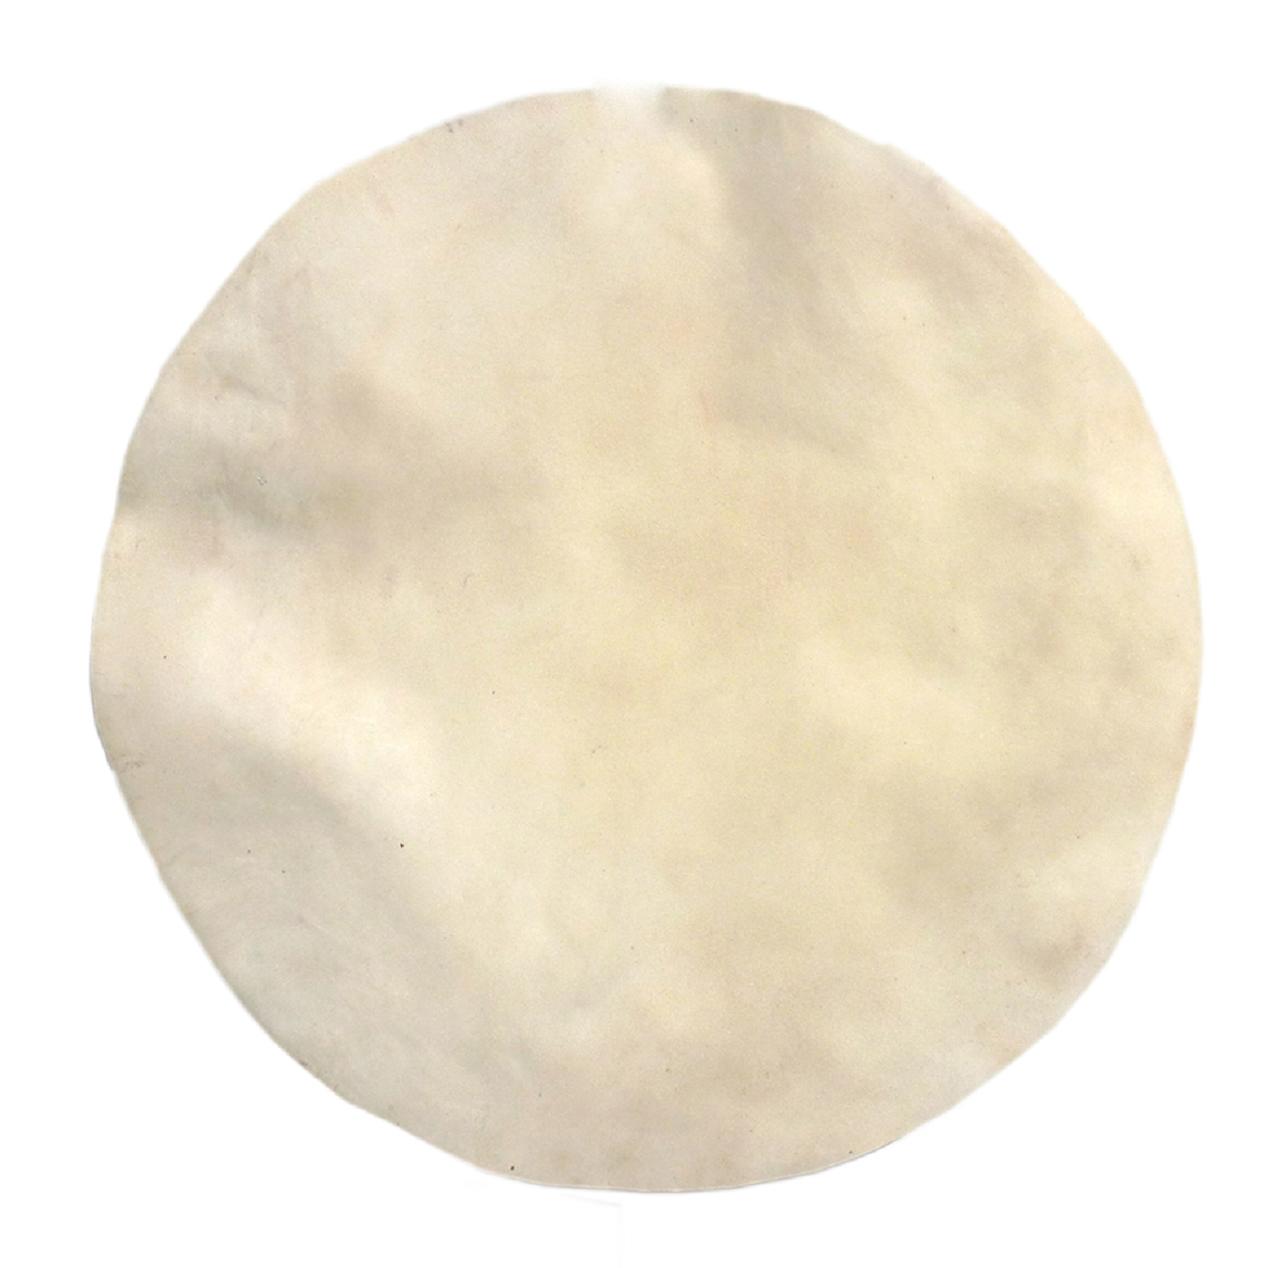 mrc 30 inch diameter white calfskin drum head 6 mil thin. Black Bedroom Furniture Sets. Home Design Ideas